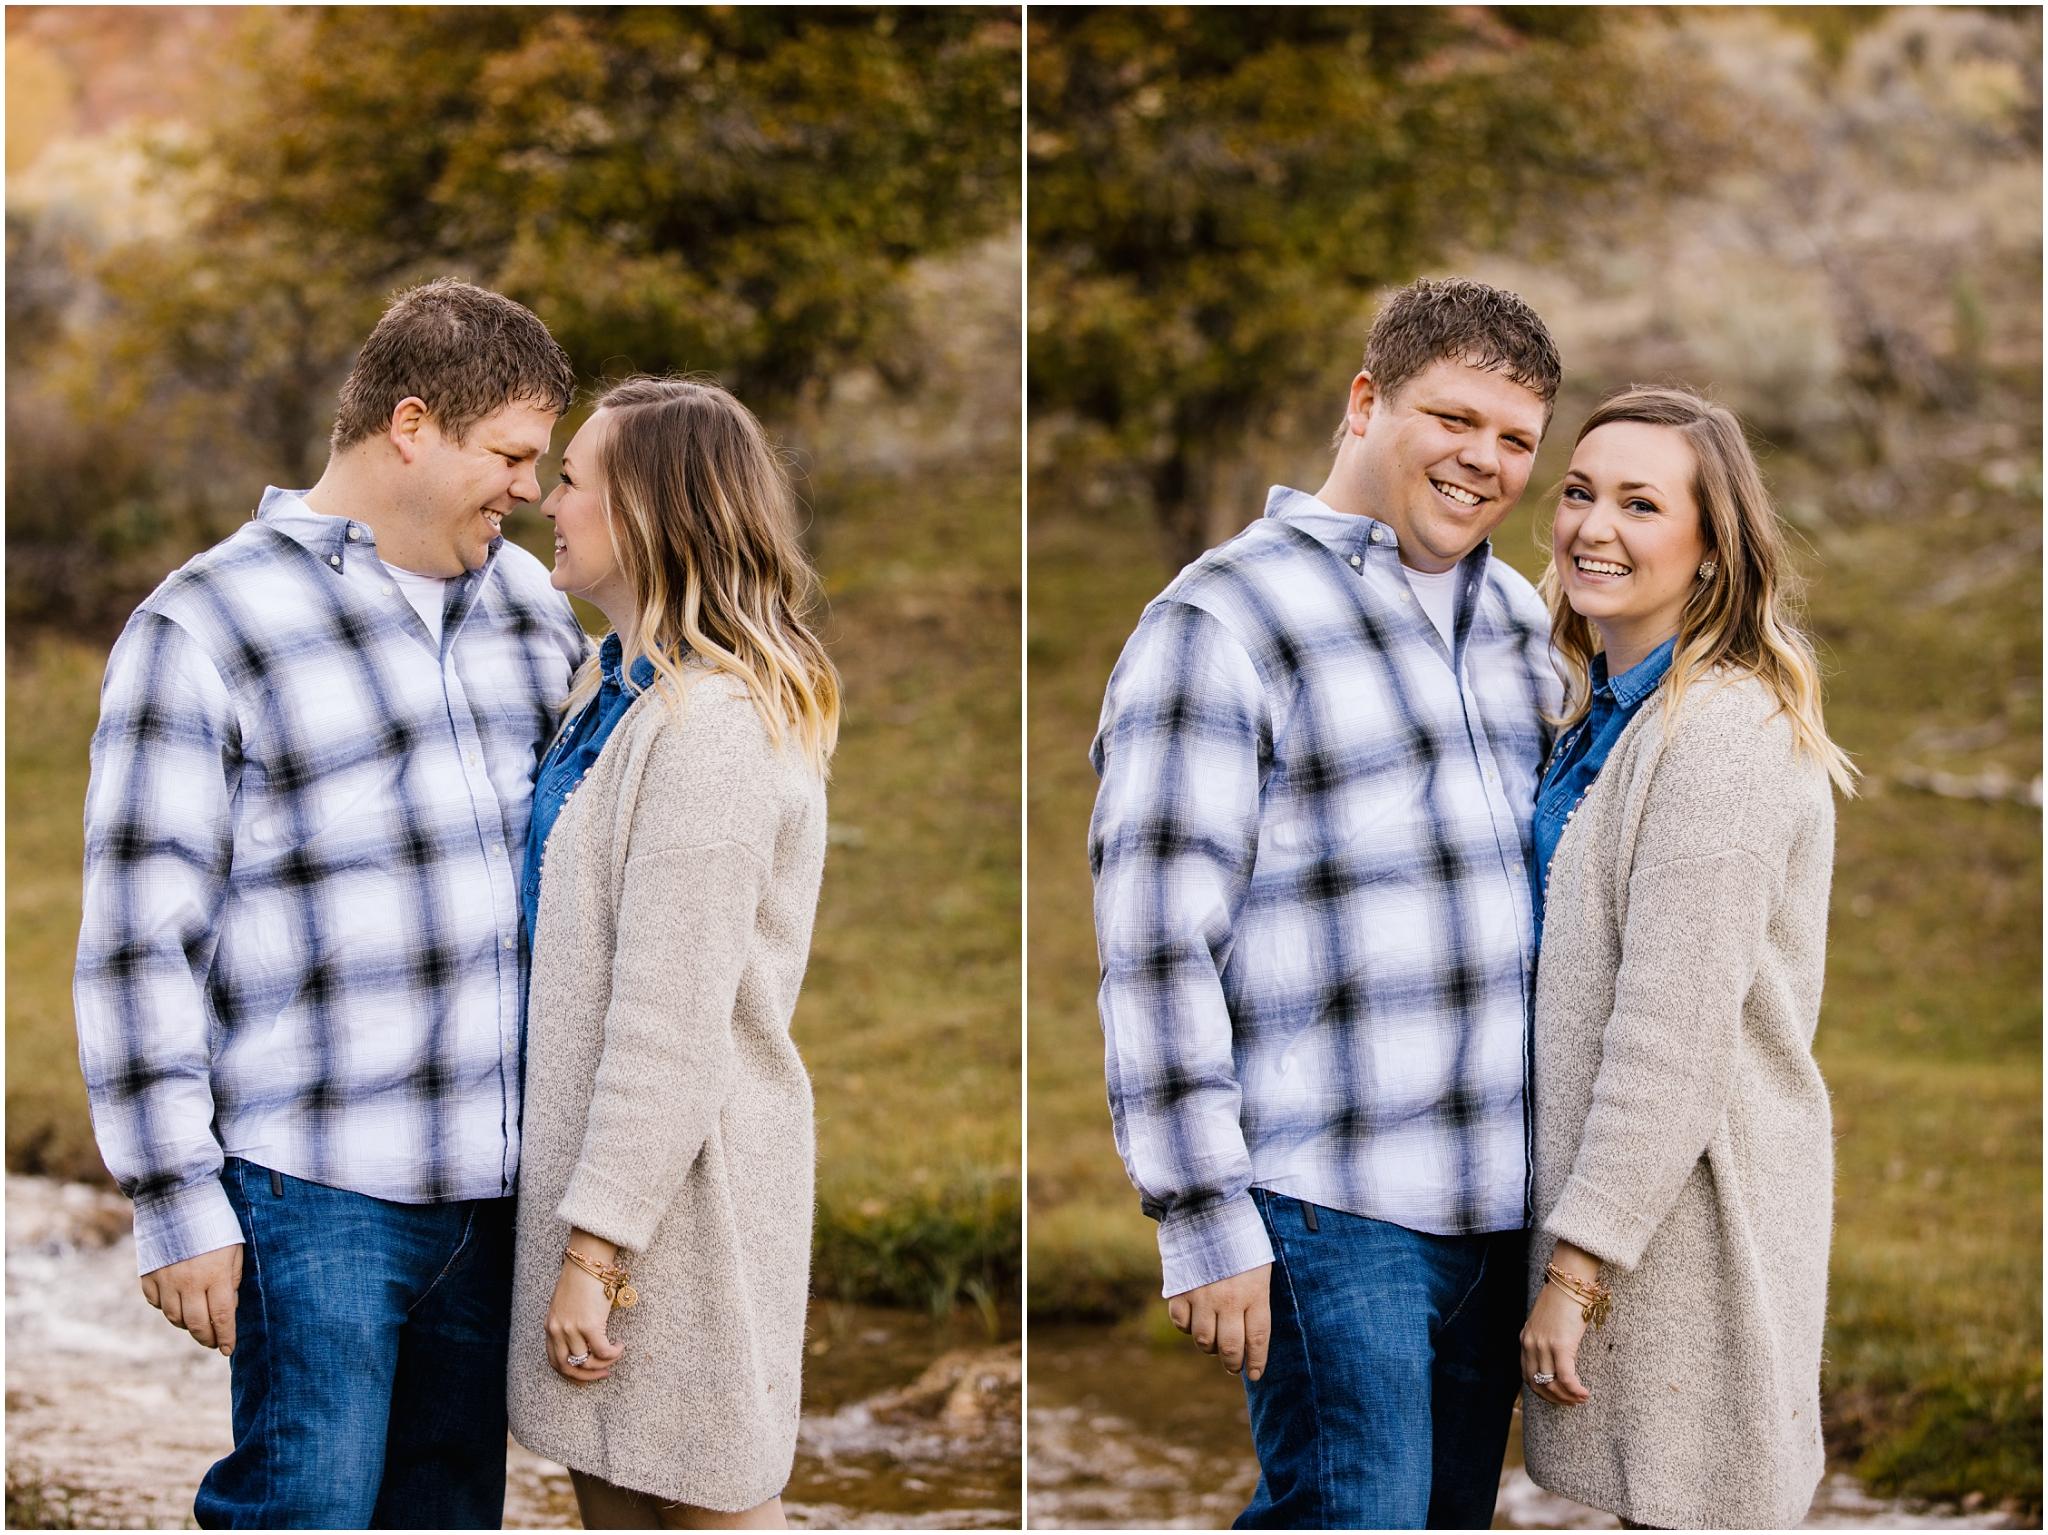 Frandsen-27_Lizzie-B-Imagery-Utah-Family-Photographer-Utah-County-Central-Utah-Park-City-Salt-Lake-City.jpg